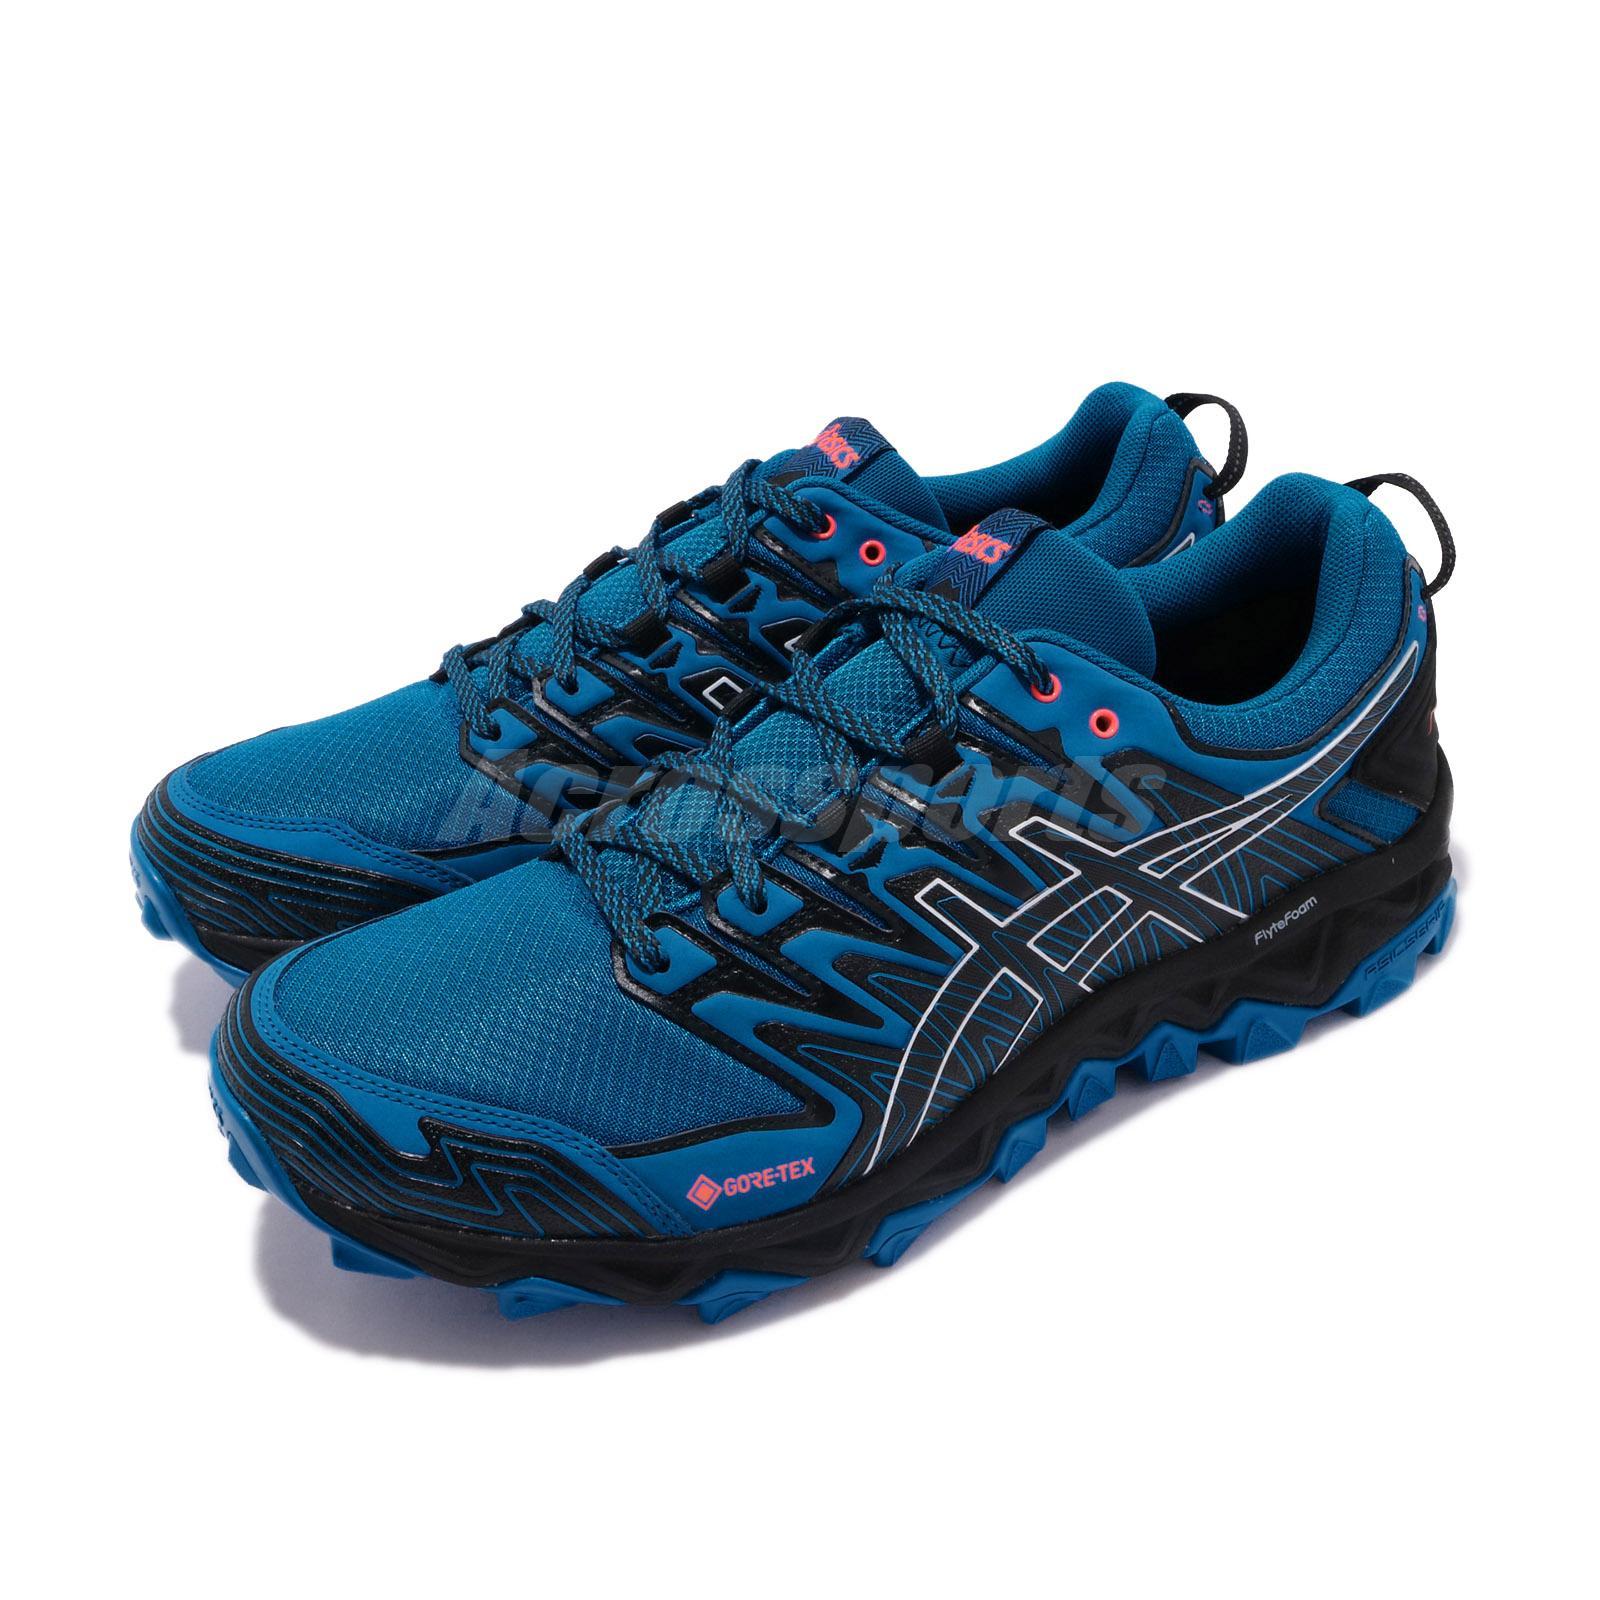 suurin alennus poimittu Alin hinta Details about Asics Gel-Fujitrabuco 7 GTX Gore-Tex Electric Blue Men  Running Shoe 1011A209-400